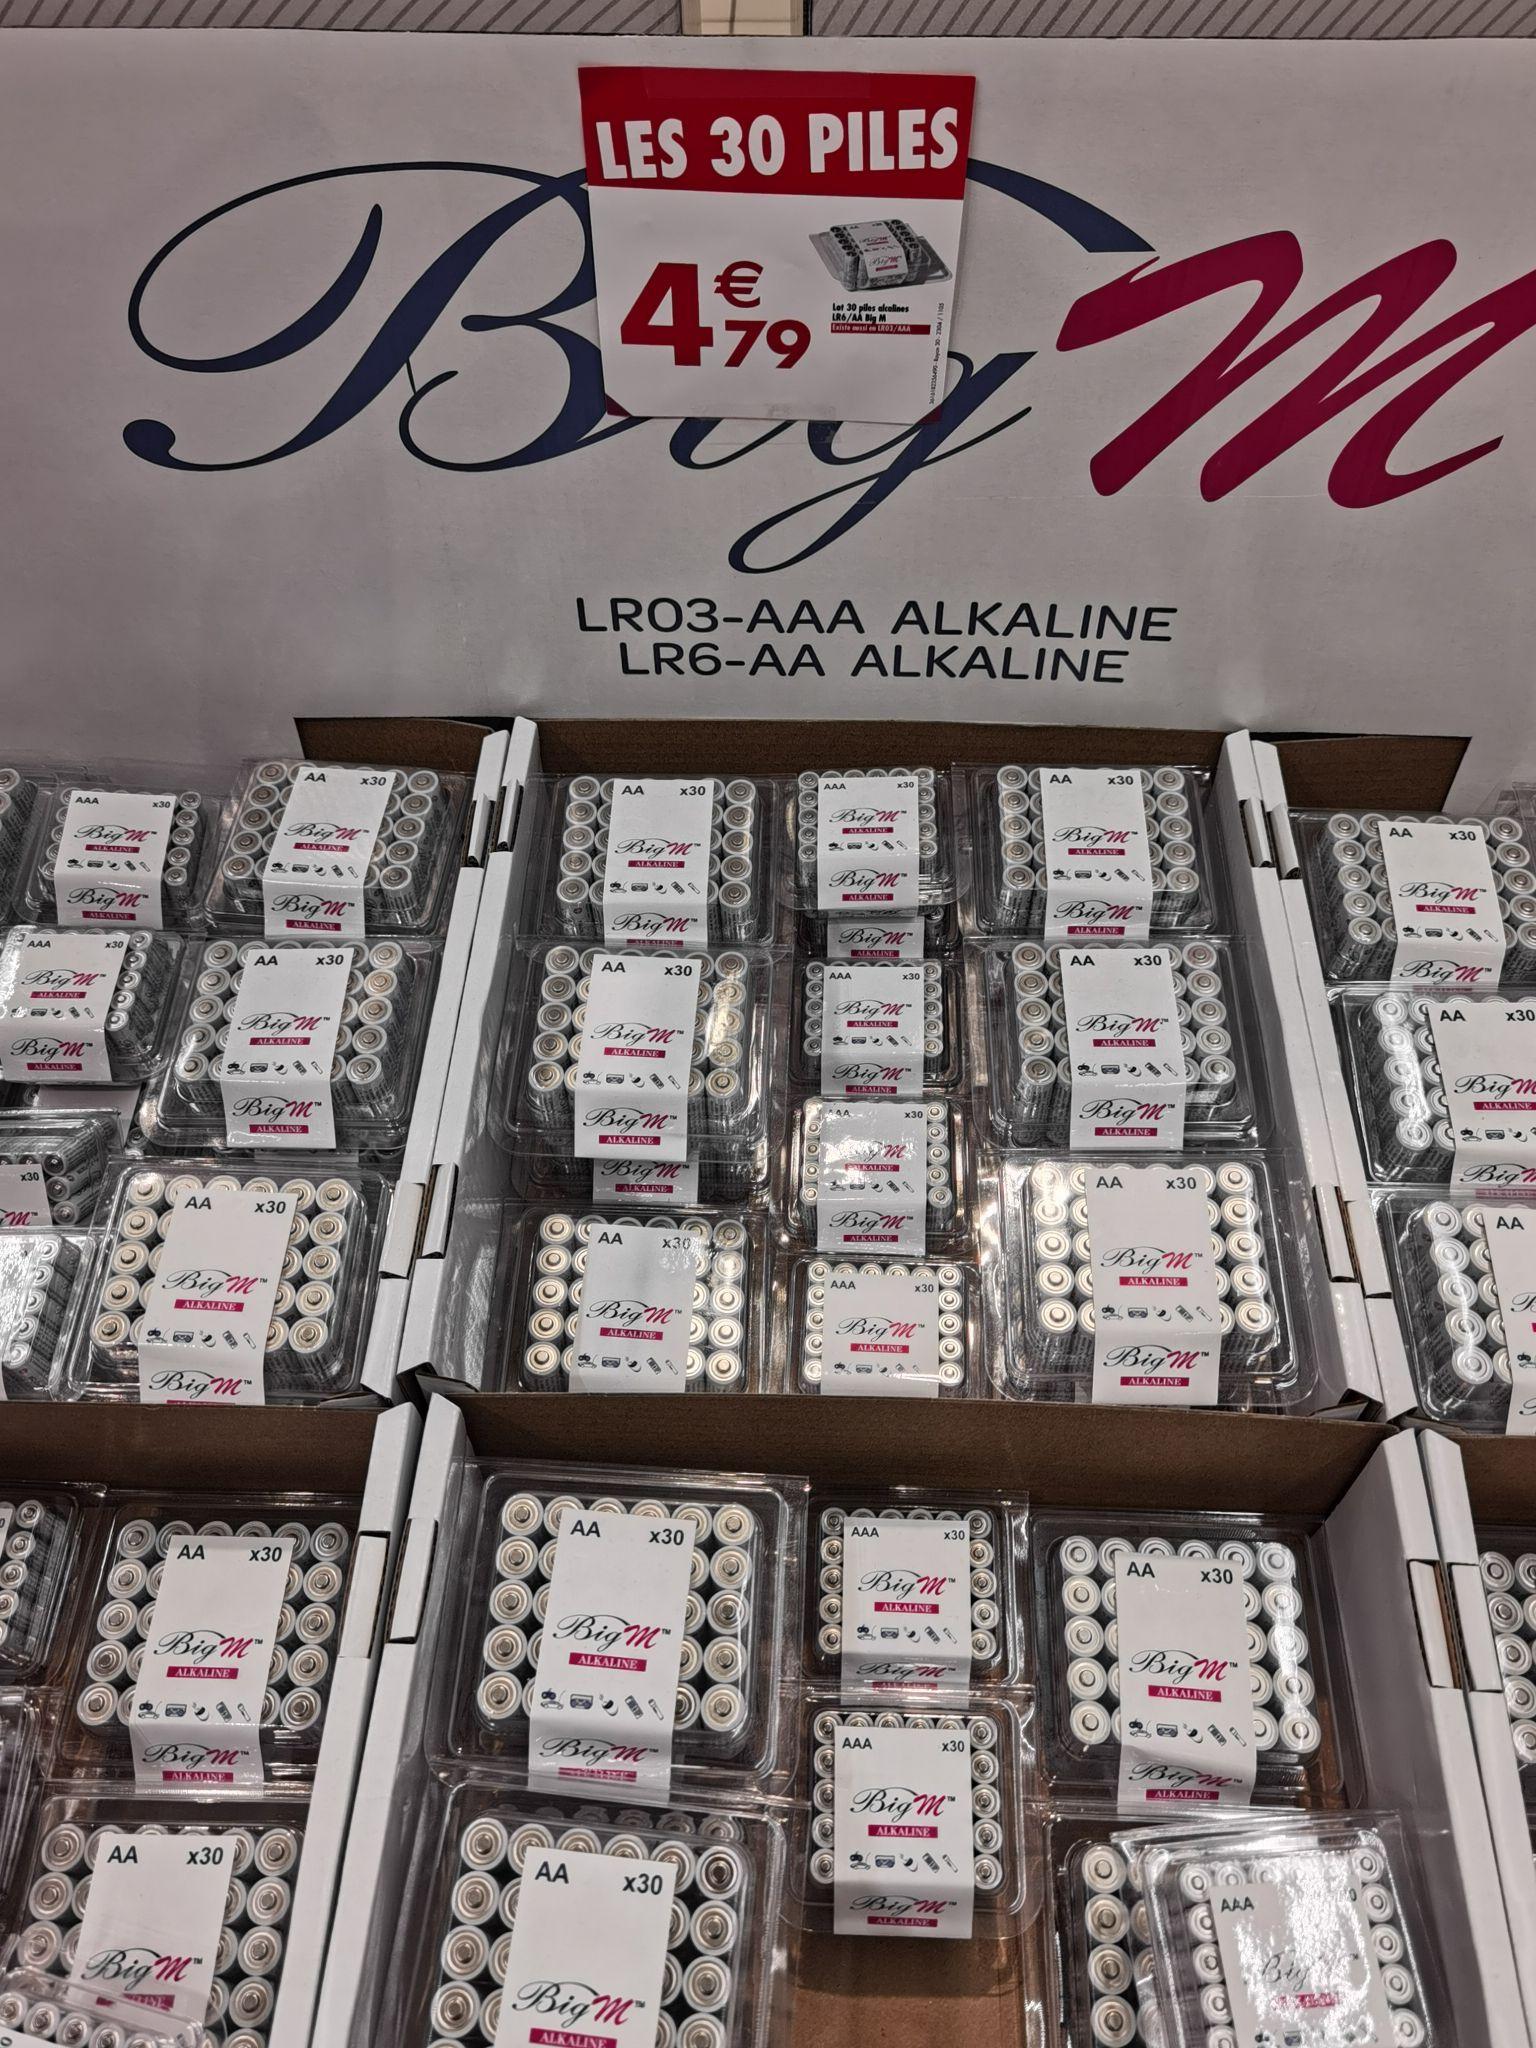 Lot de 30 piles AA ou AAA - Quimper (29)